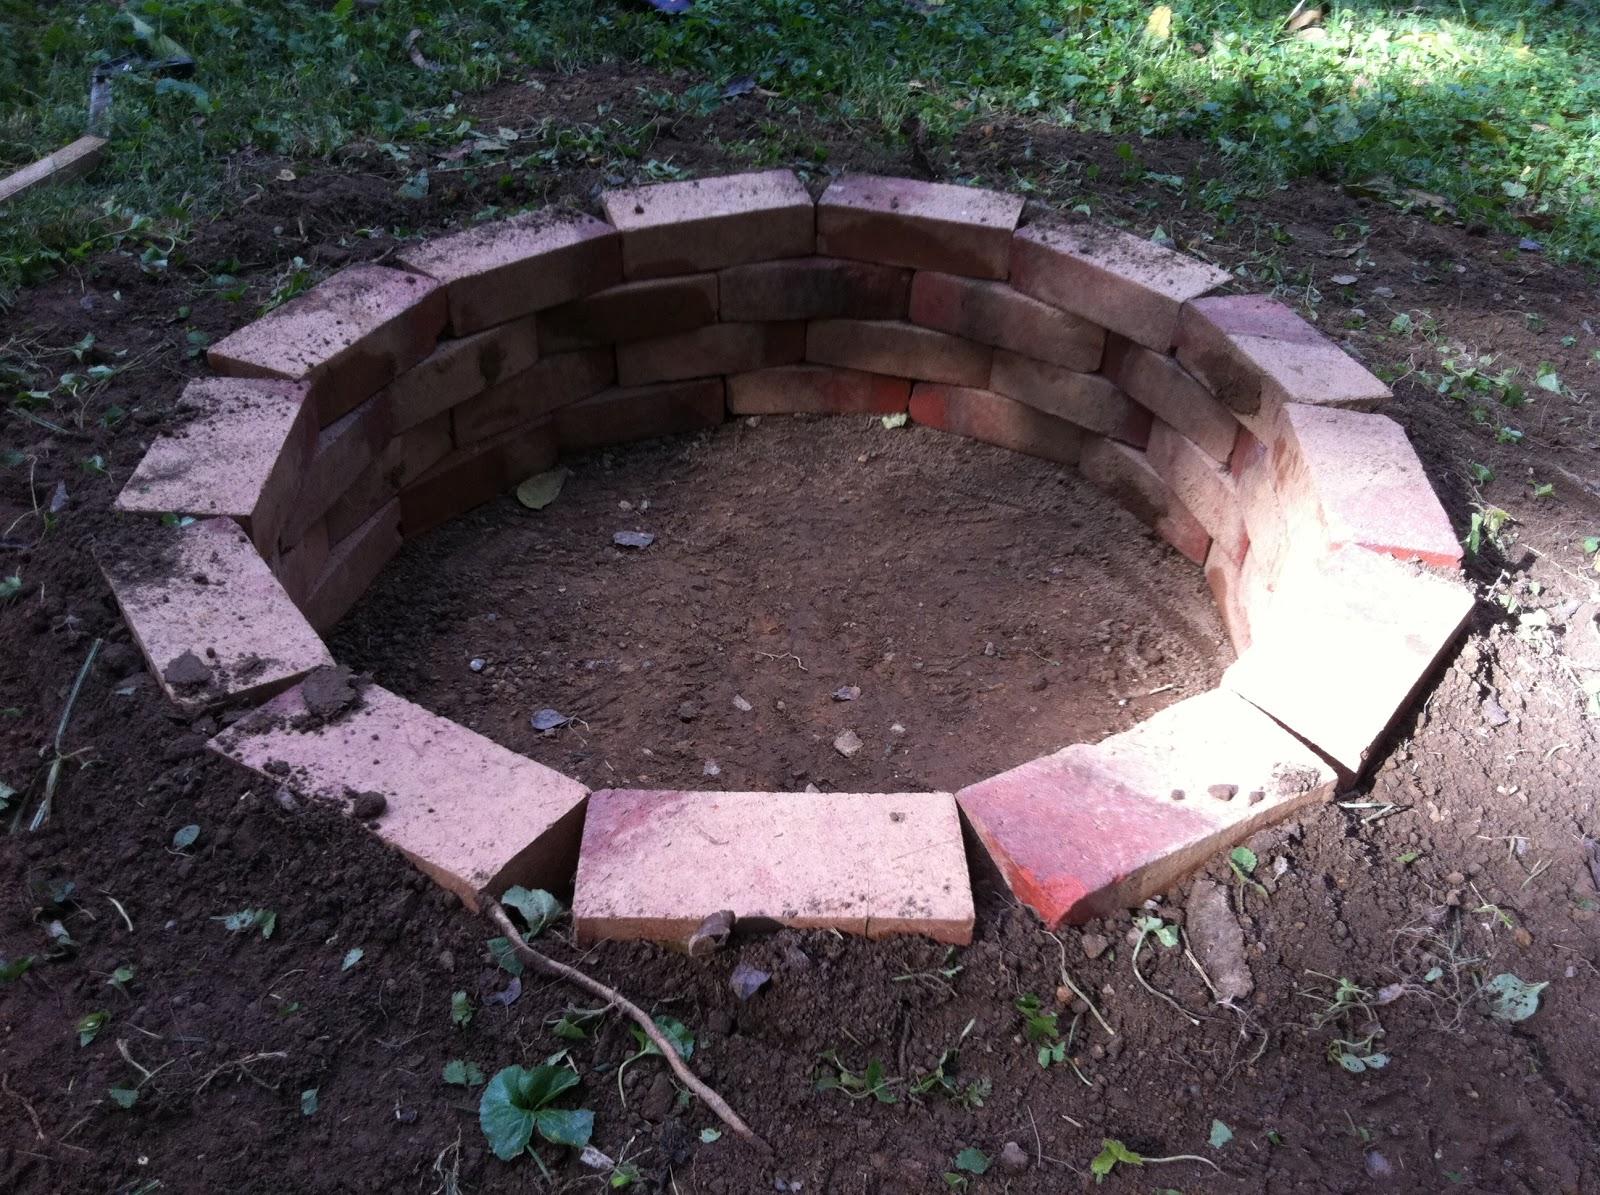 ... fire pit diy fire pit fire pits diy instructions diy metal fire pit